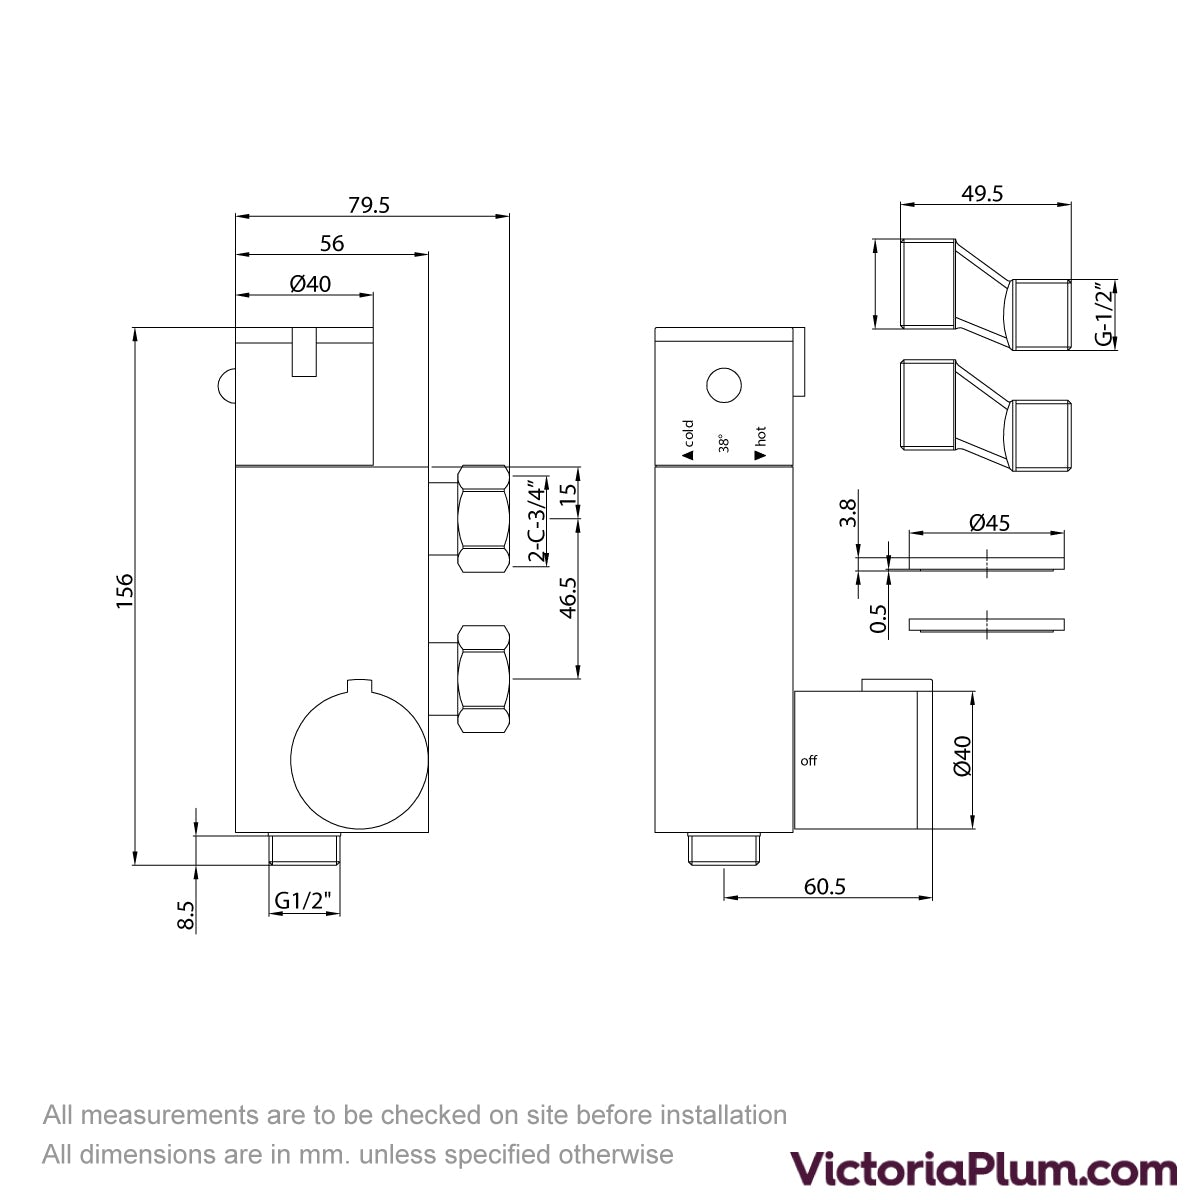 Dimensions for Orchard Vertical shower bar valve